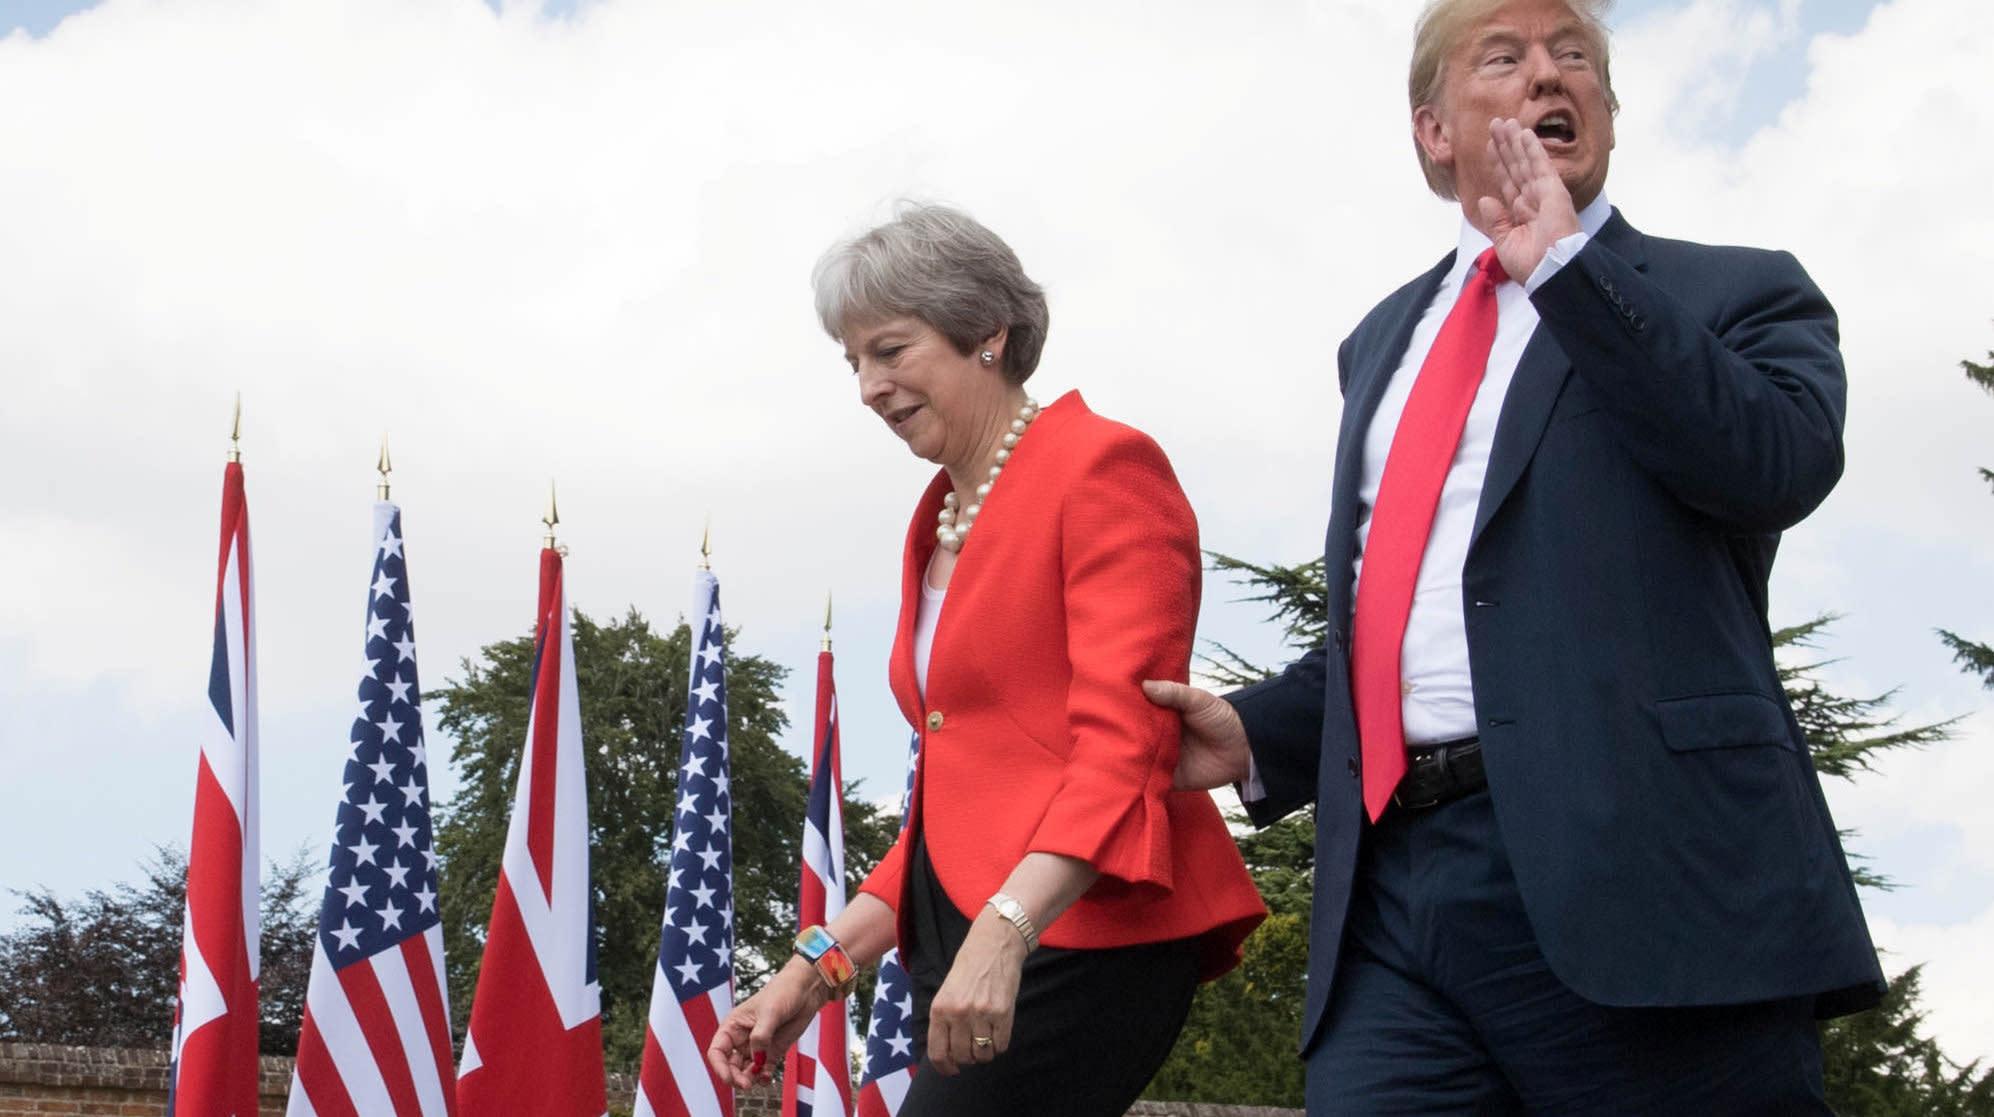 Donald Trump Declares The European Union A 'Foe'